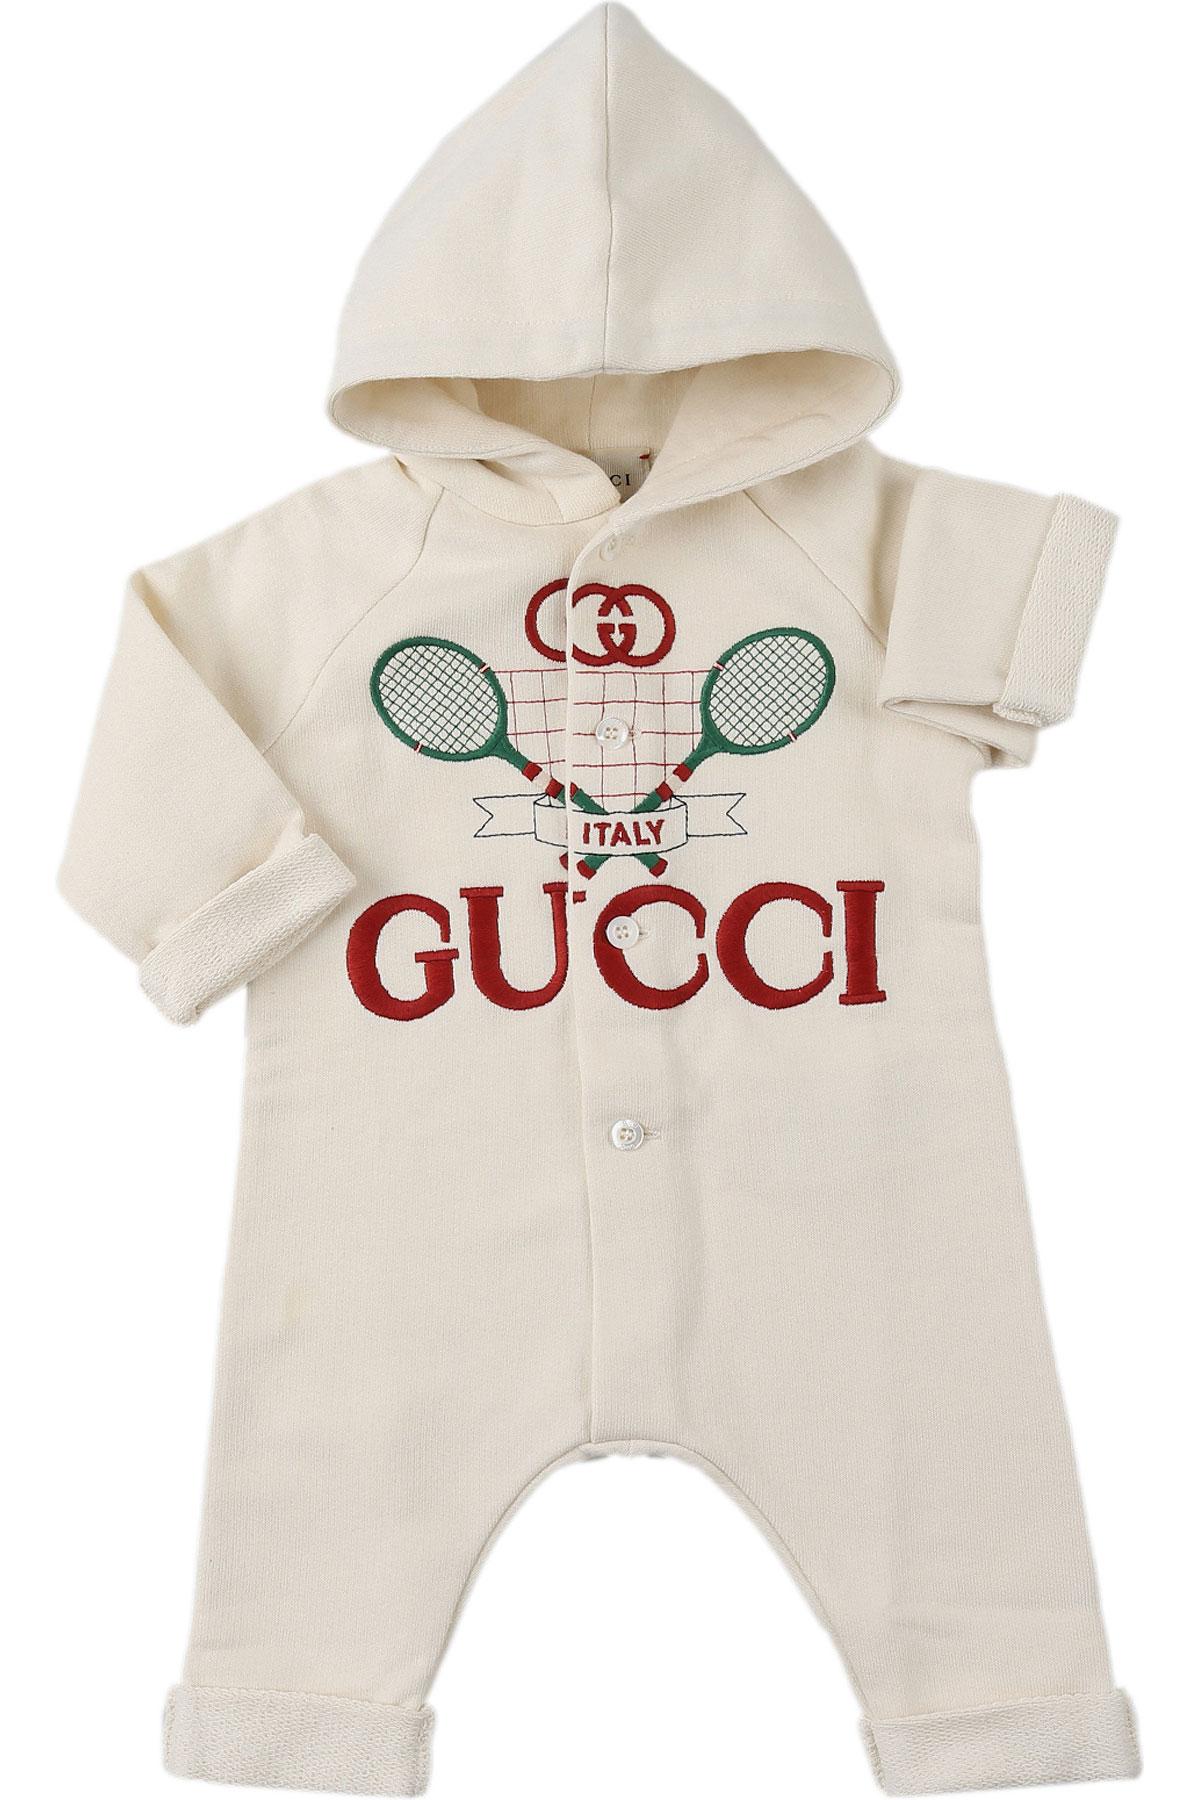 Gucci Baby Bodysuits & Onesies for Boys On Sale, White, Cotton, 2019, 12 M 1M 3M 6M 6M 9M